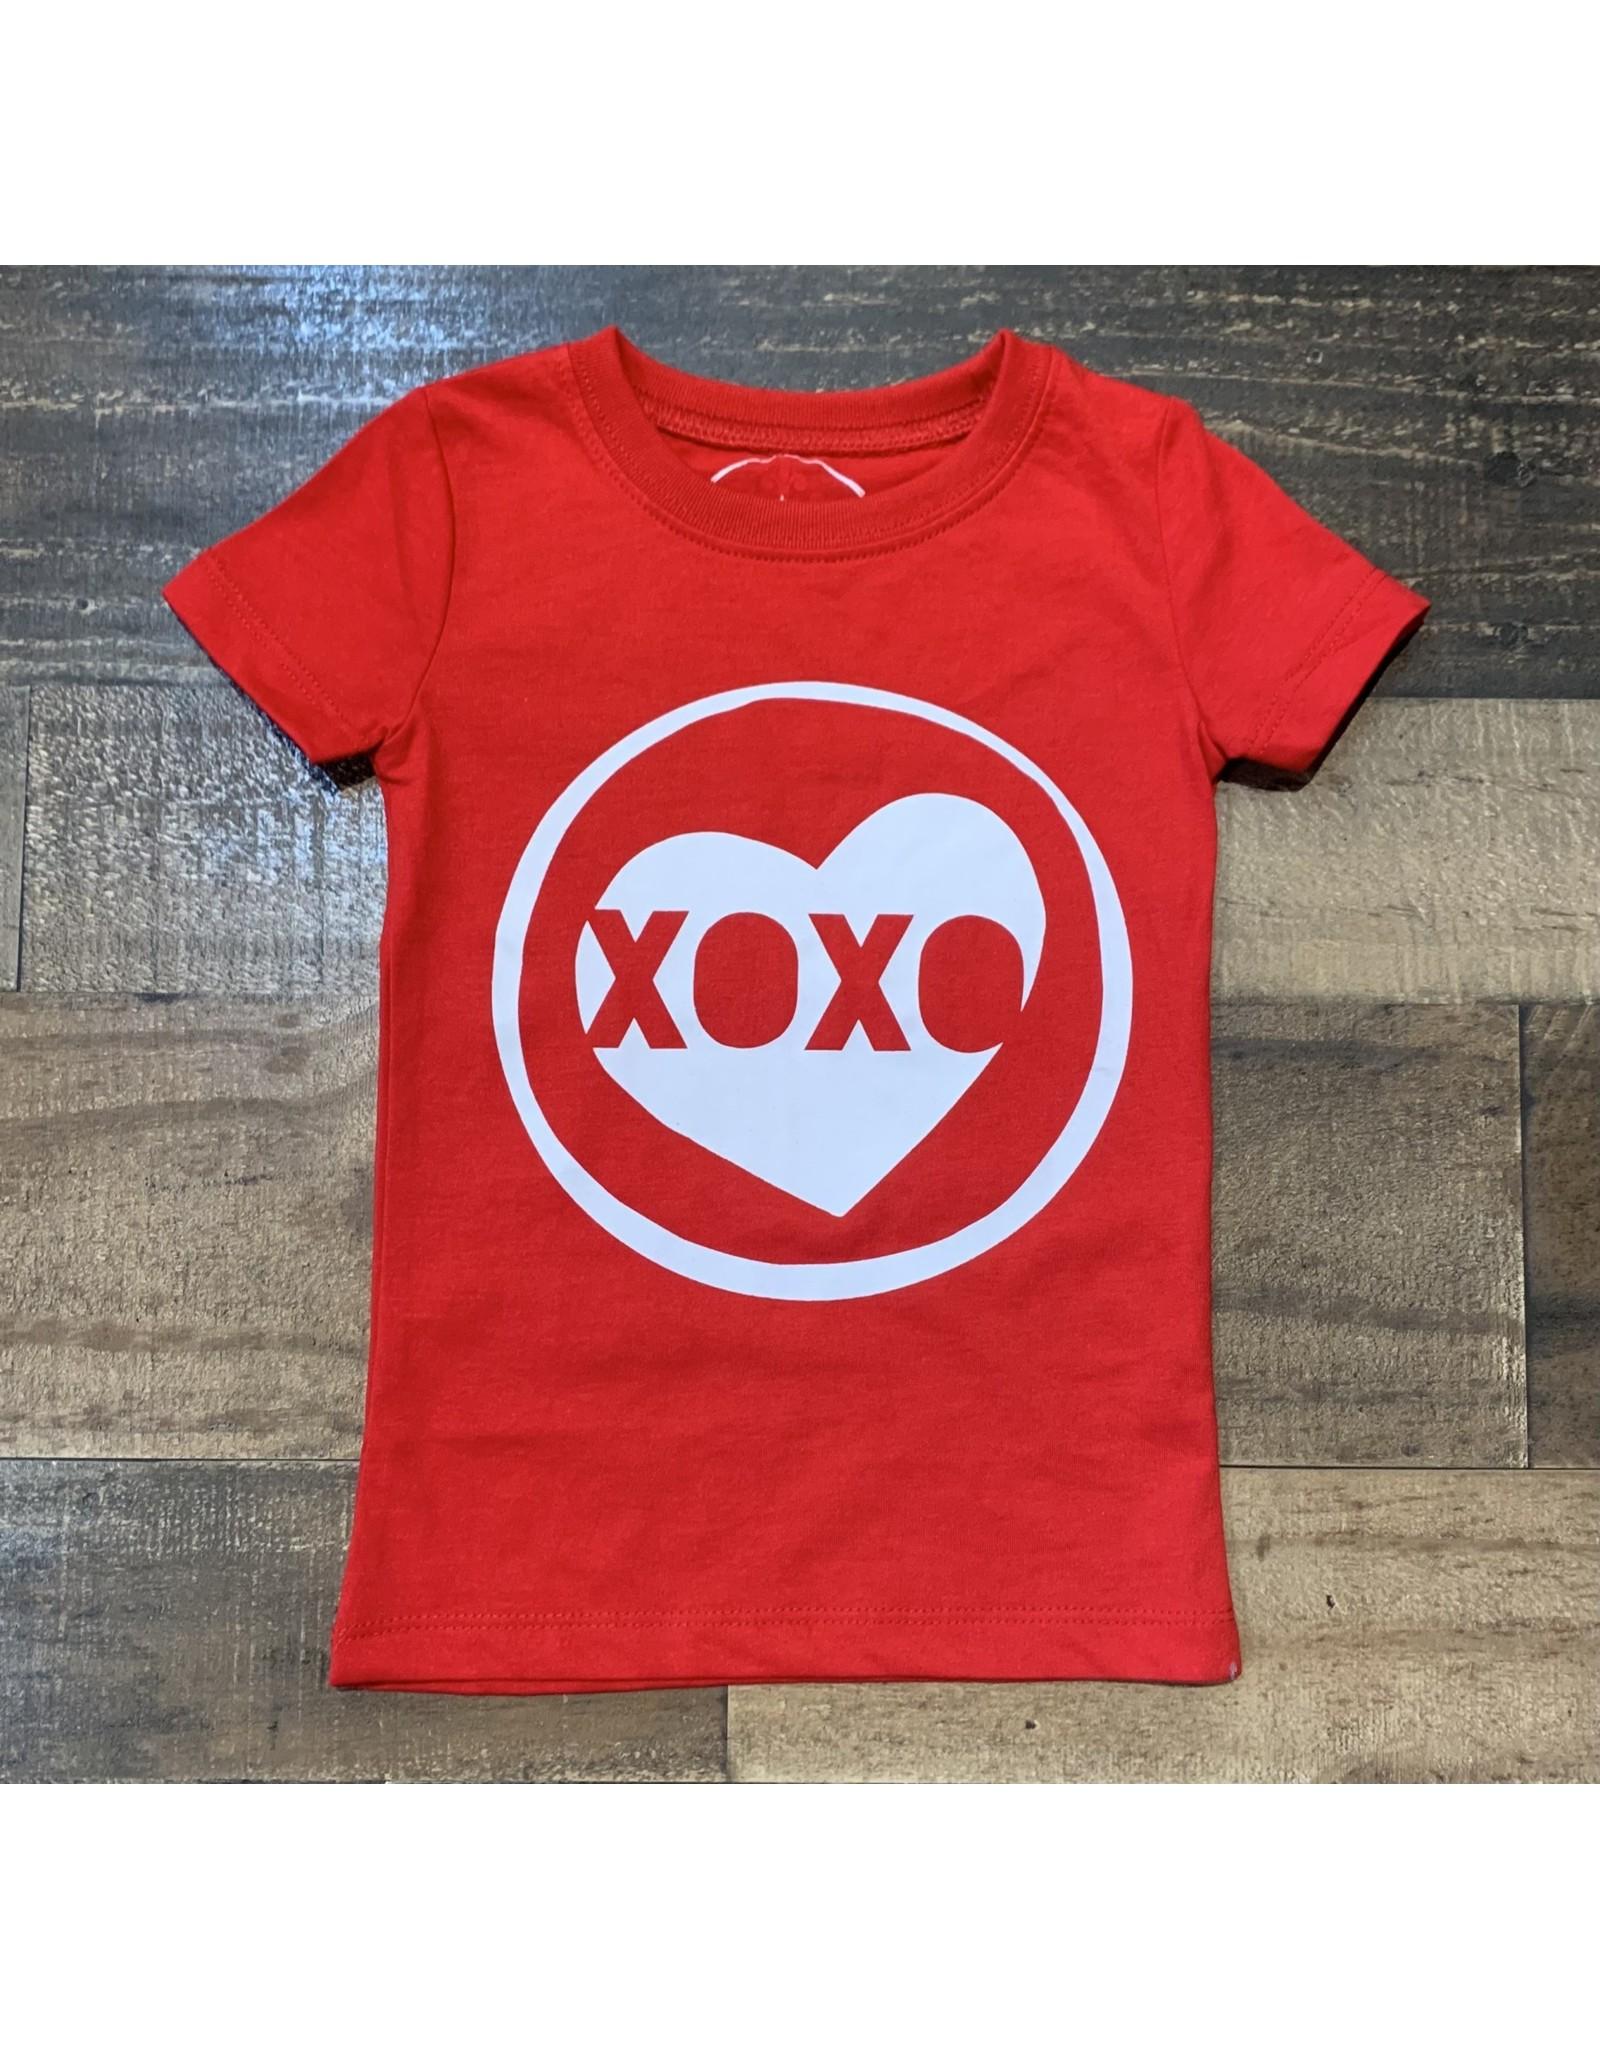 Jane Marie- XOXO Red Cew Neck Shirt